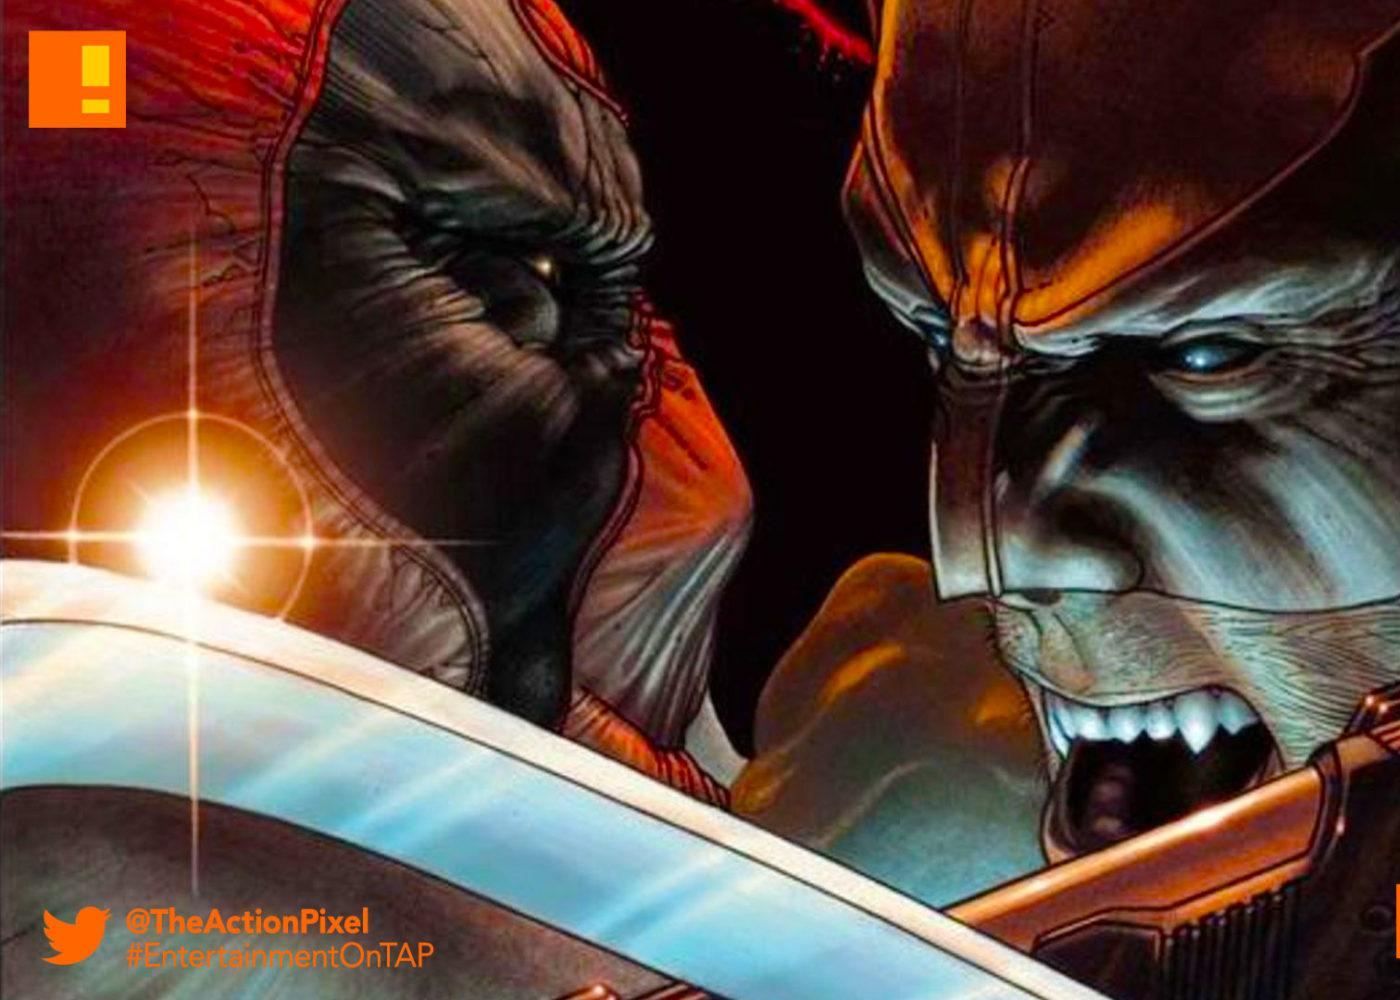 wolverine, Deadpool, marvel, the action pixel, entertainment on tap,